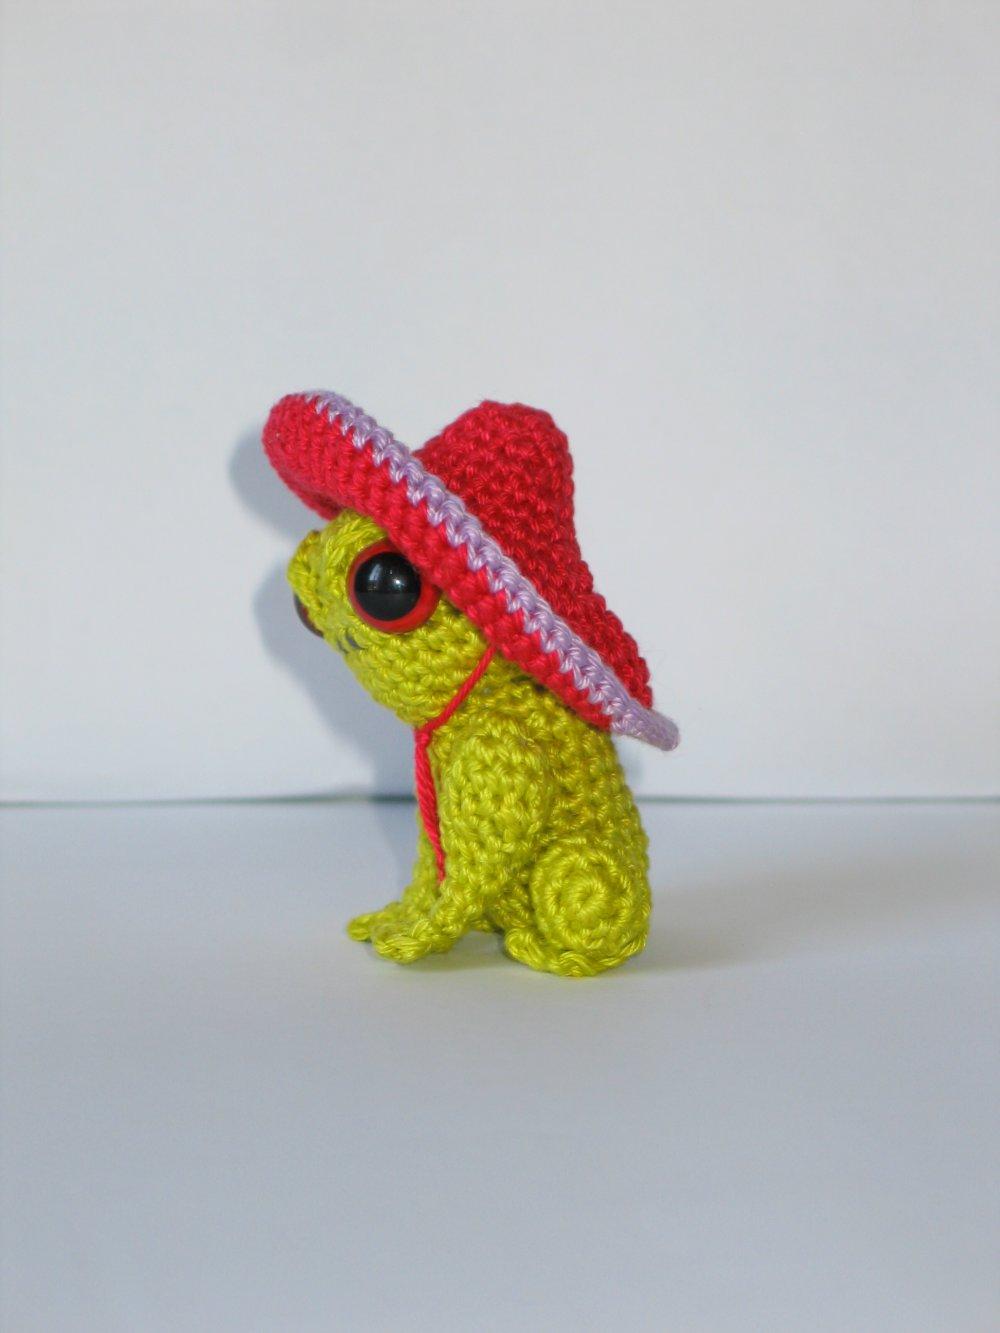 Grenouille au crochet et sombrero